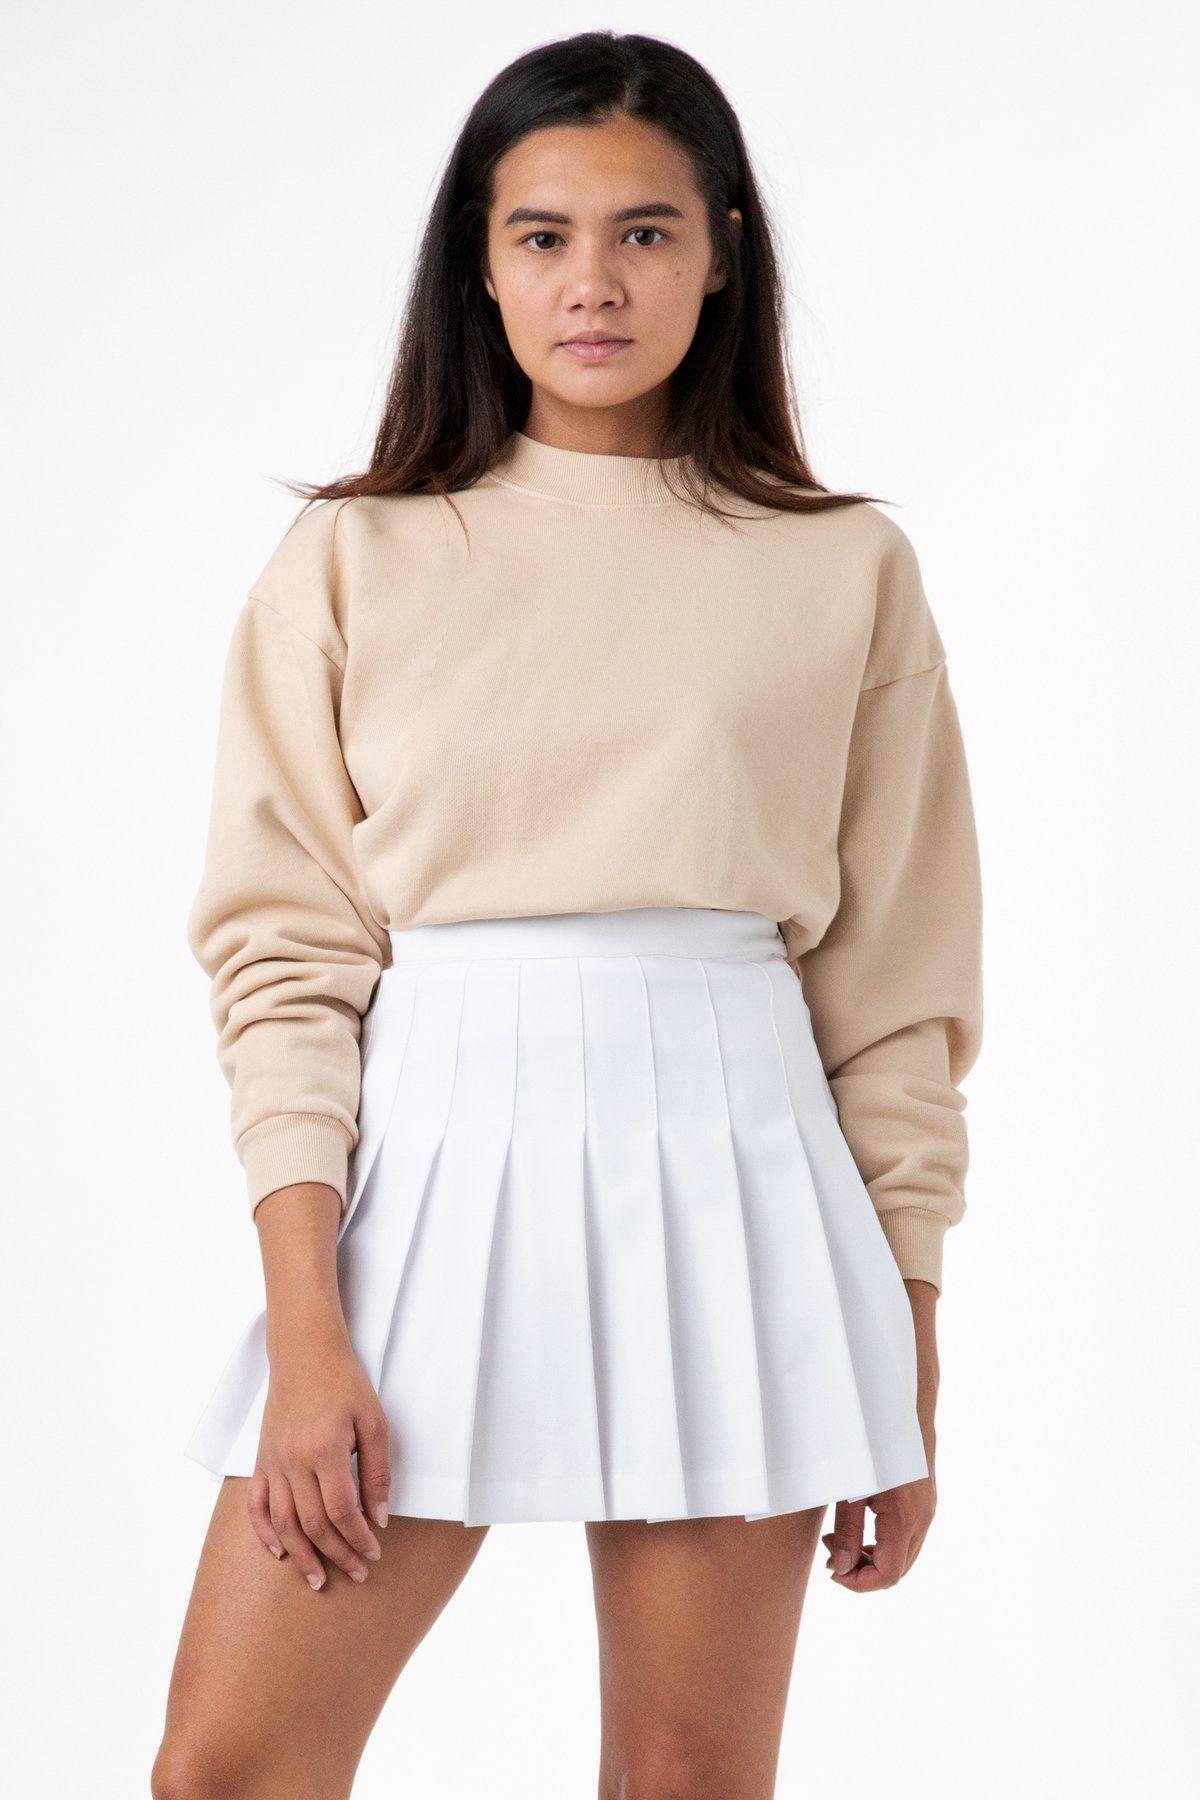 Rgb300 Tennis Skirt In 2020 White Tennis Skirt Tennis Skirt Outfit Tennis Skirt